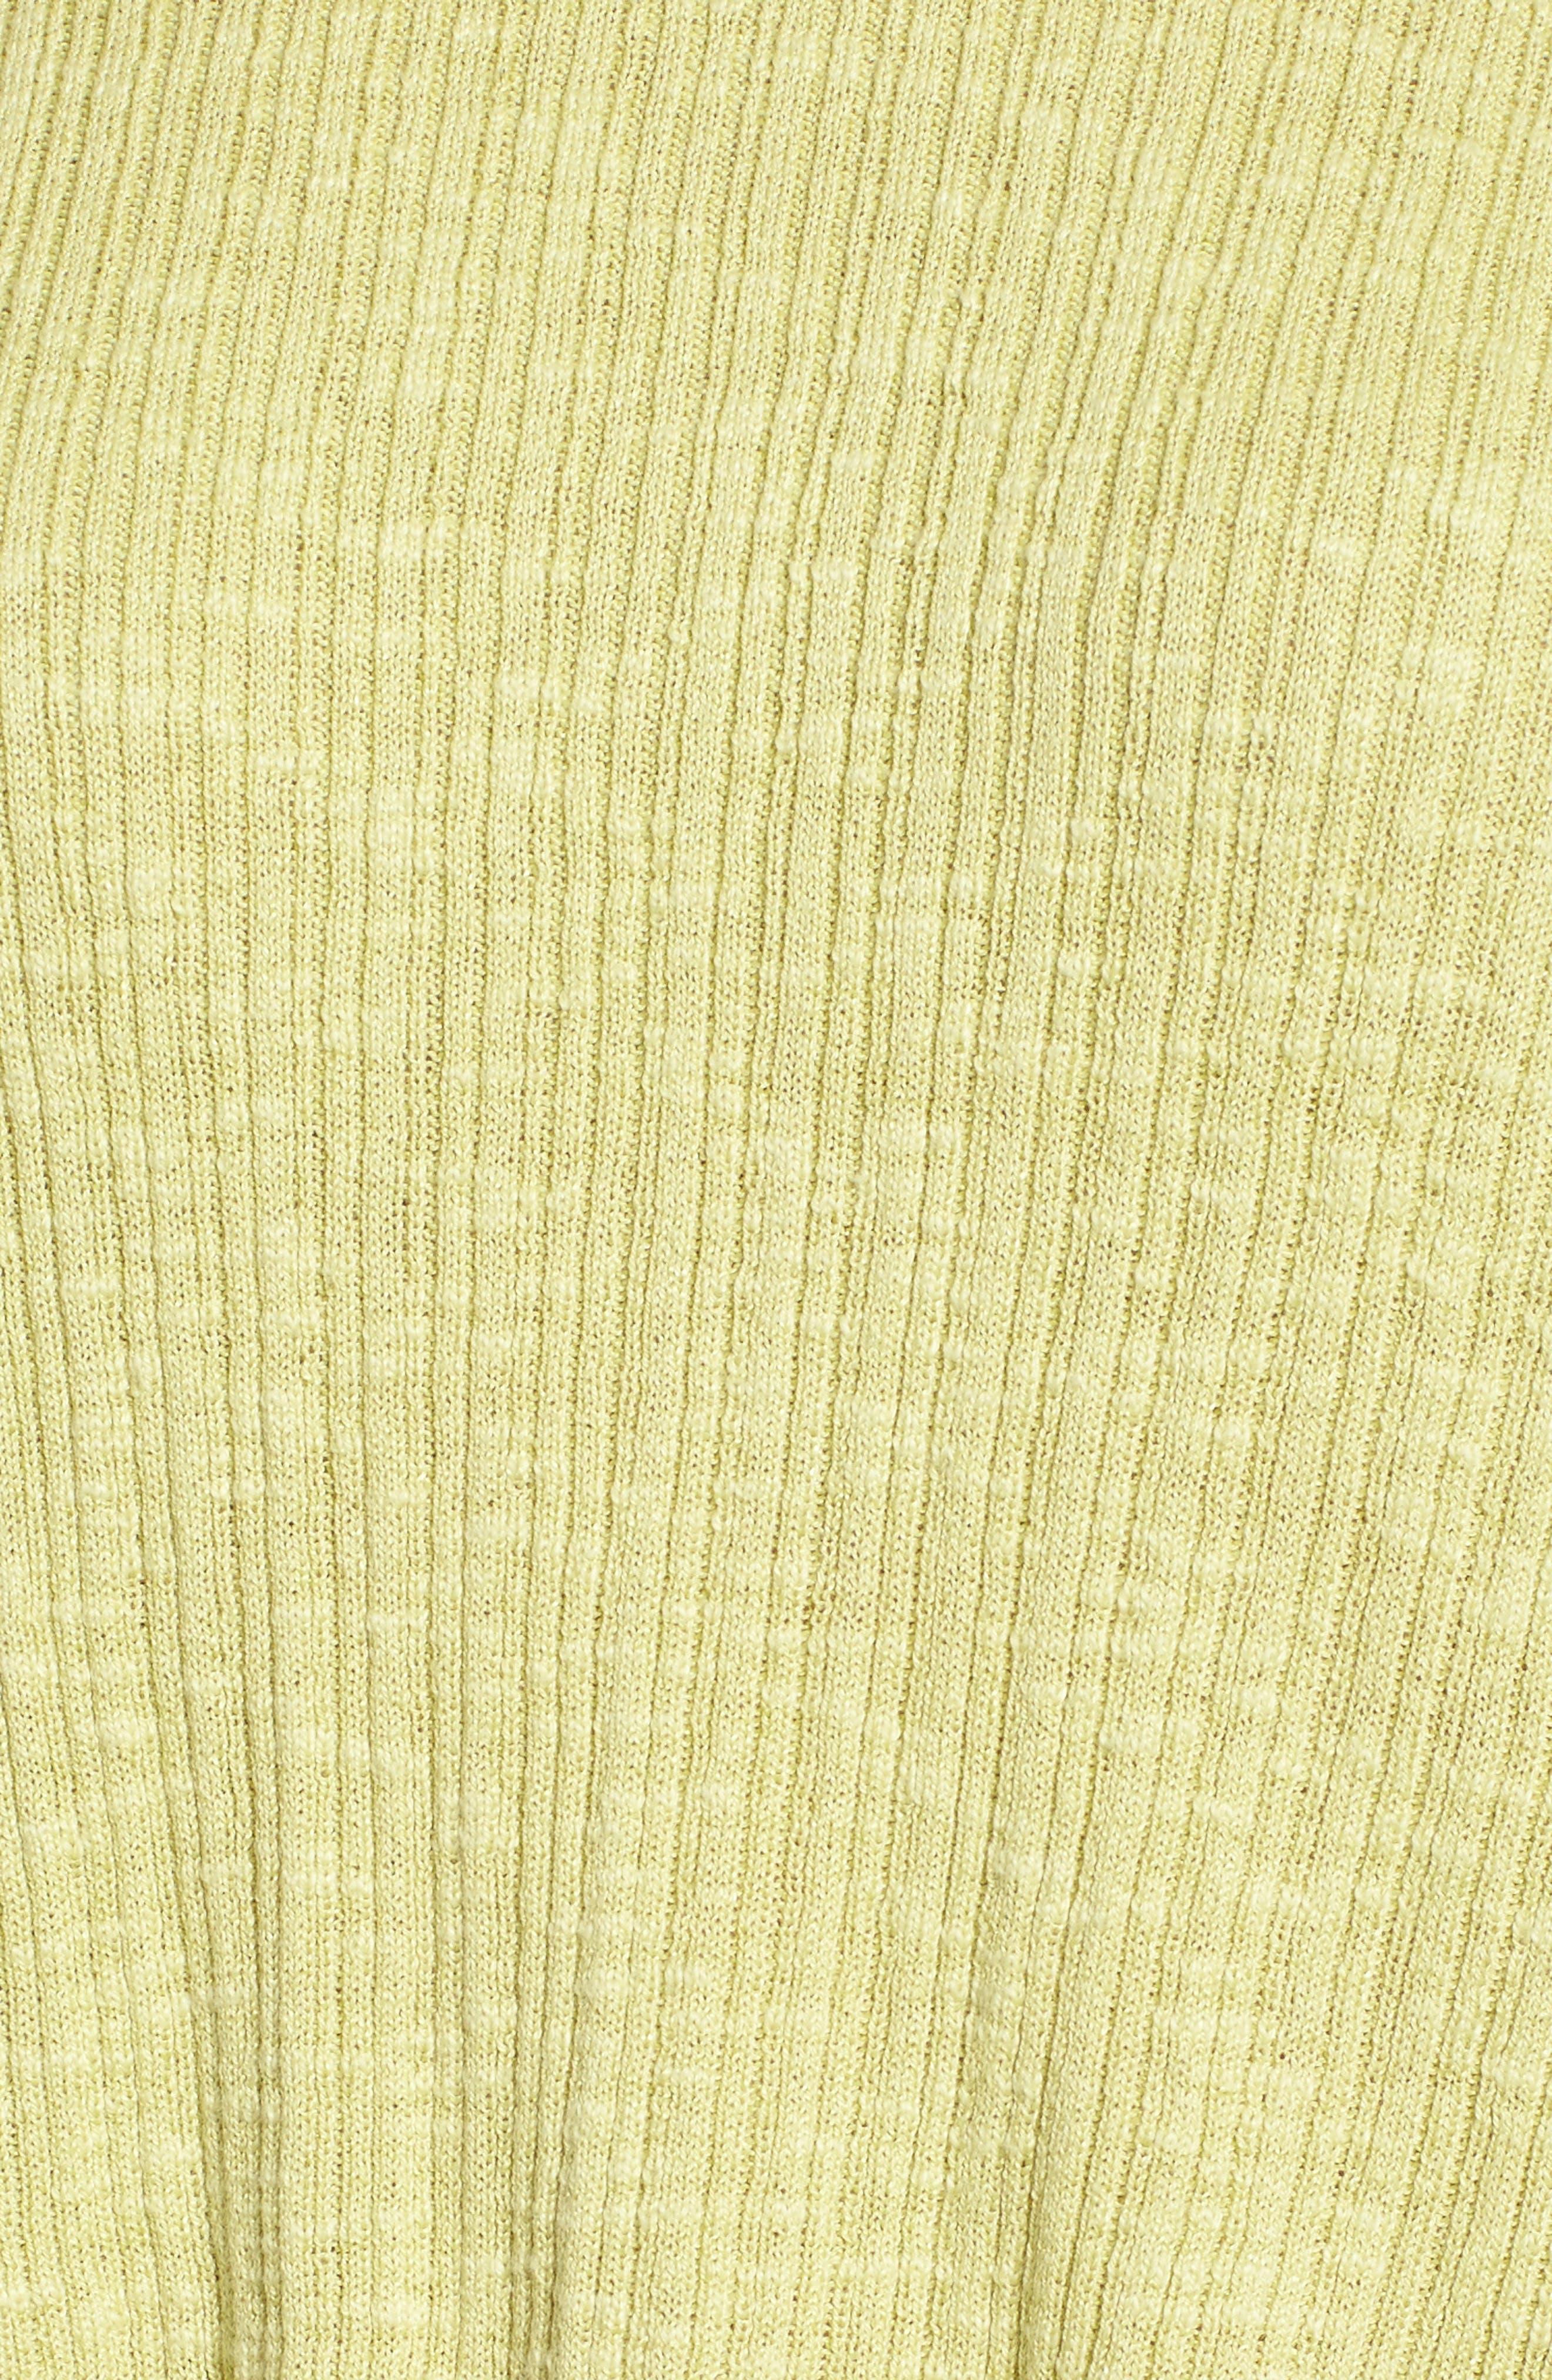 Organic Linen & Cotton Crewneck Sweater,                             Alternate thumbnail 24, color,